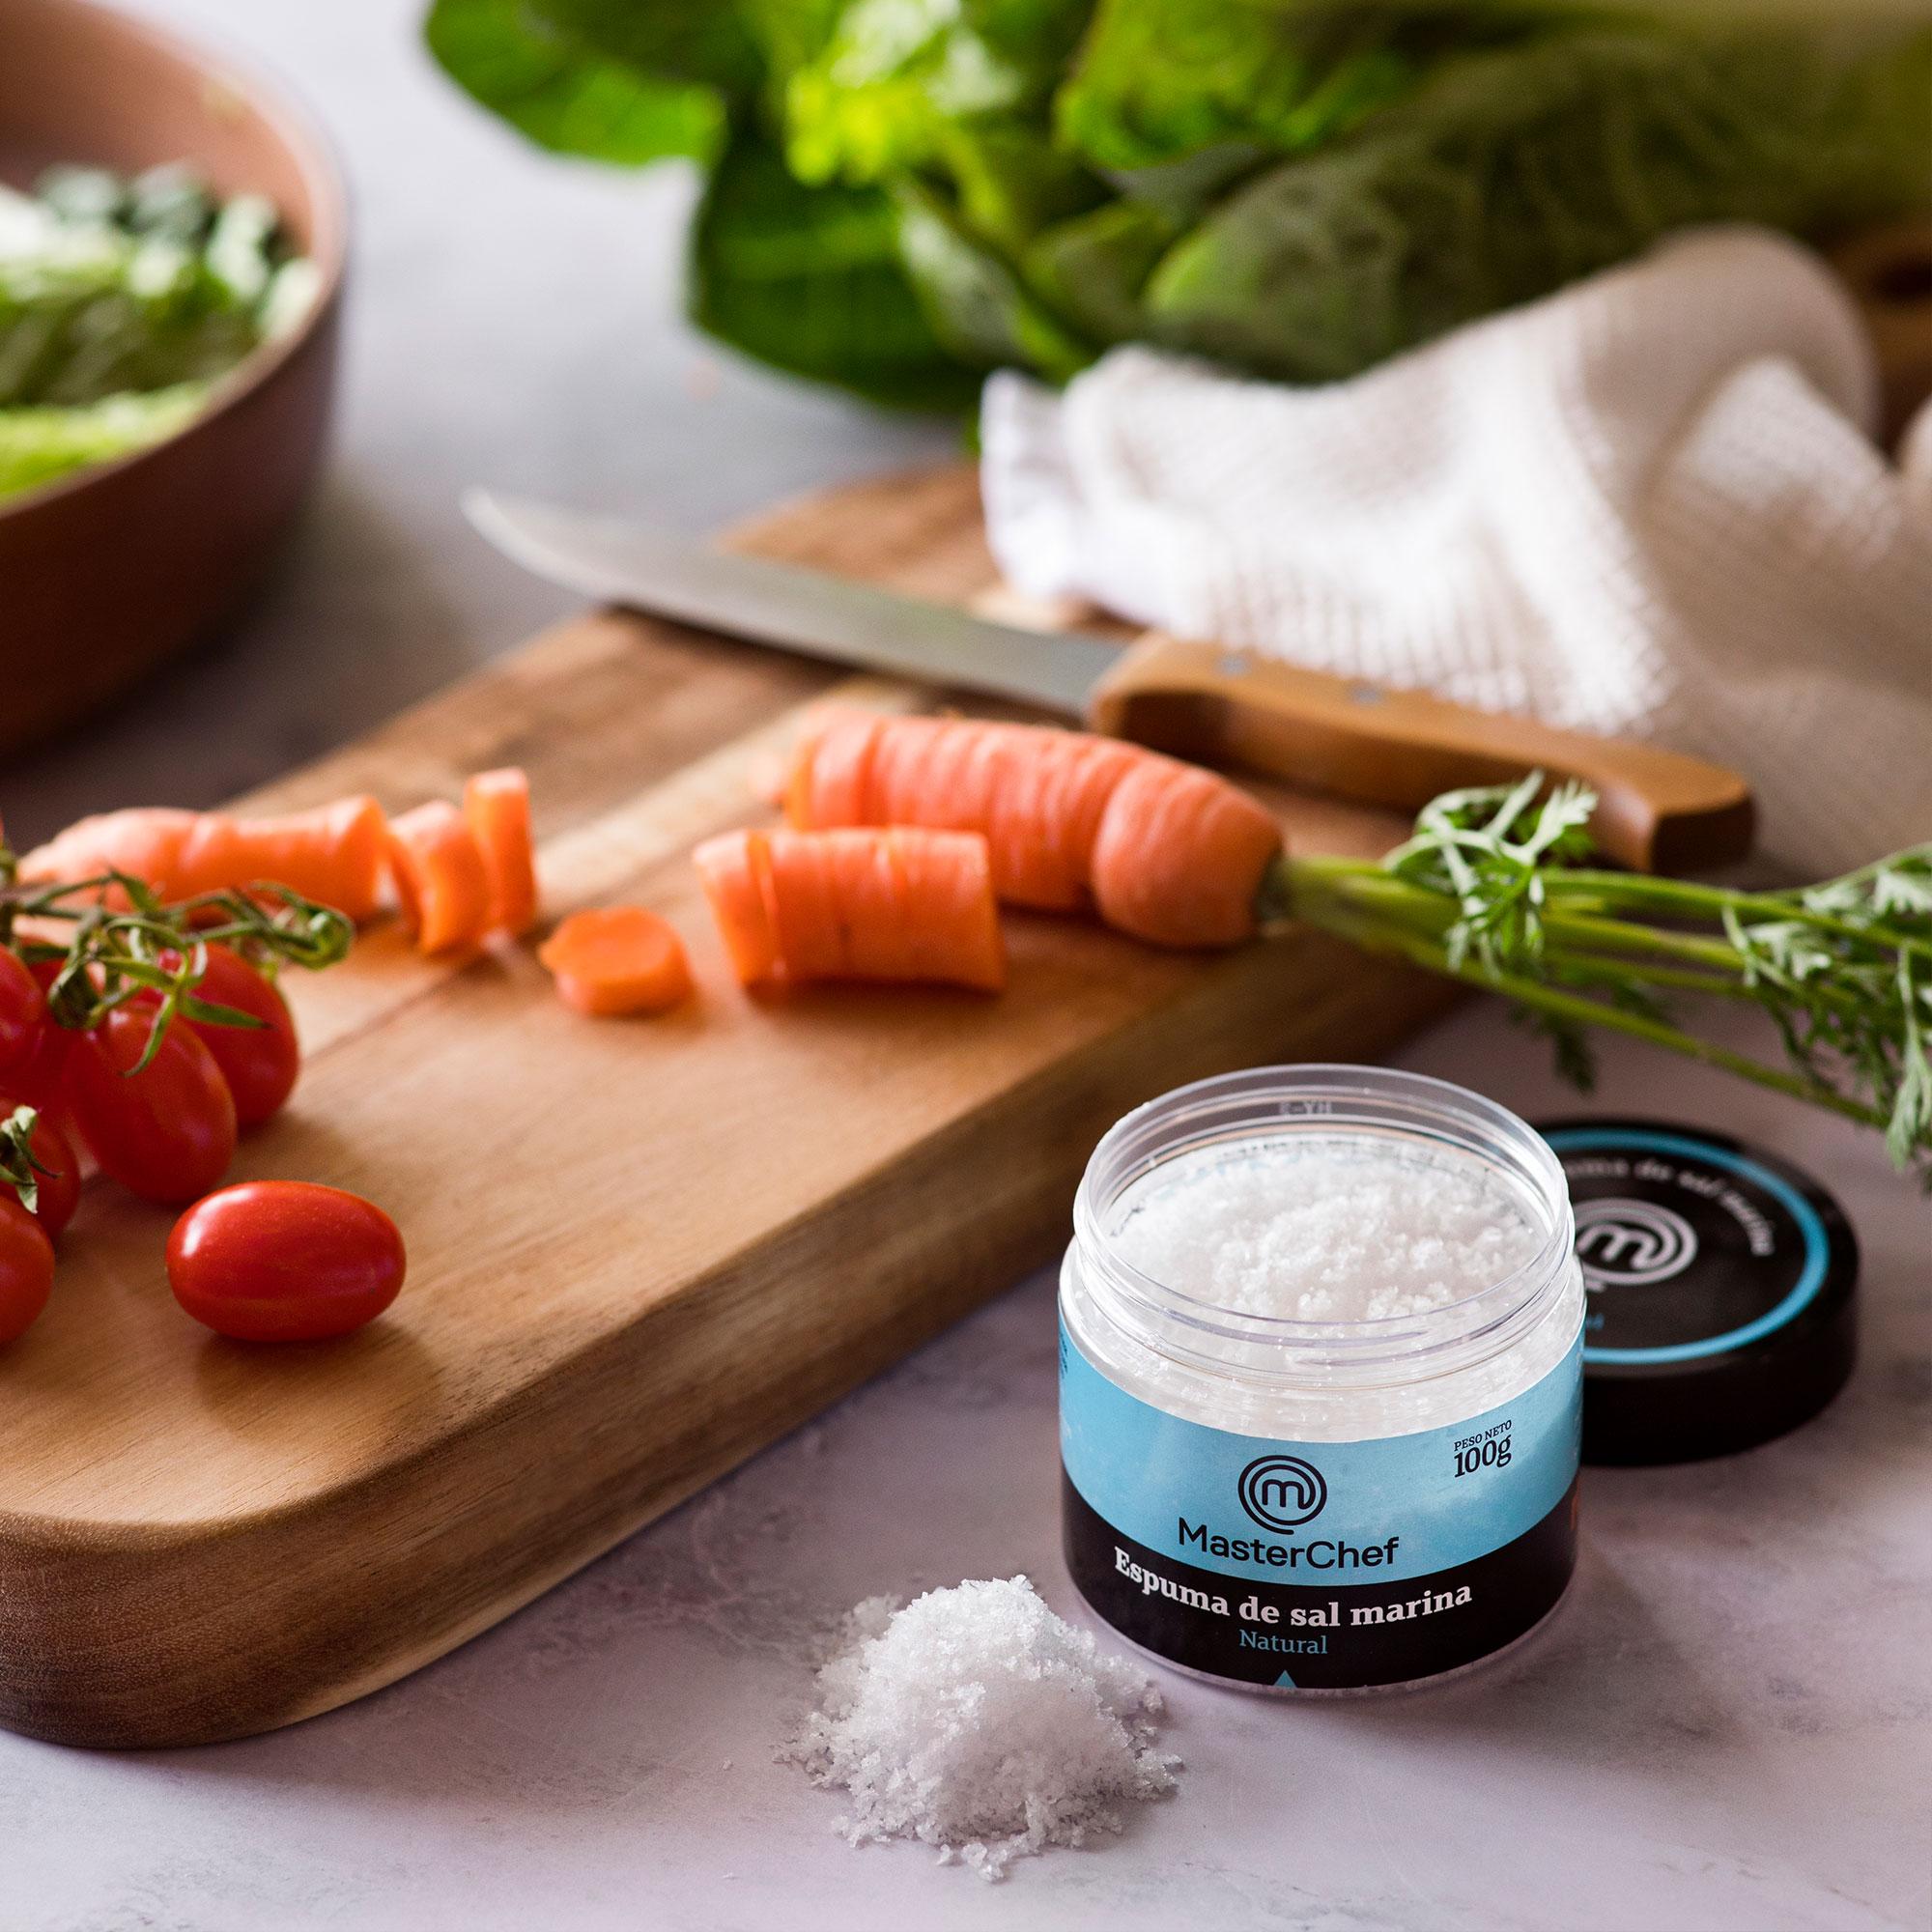 Espuma de sal natural MasterChef Polasal 100g cocinando